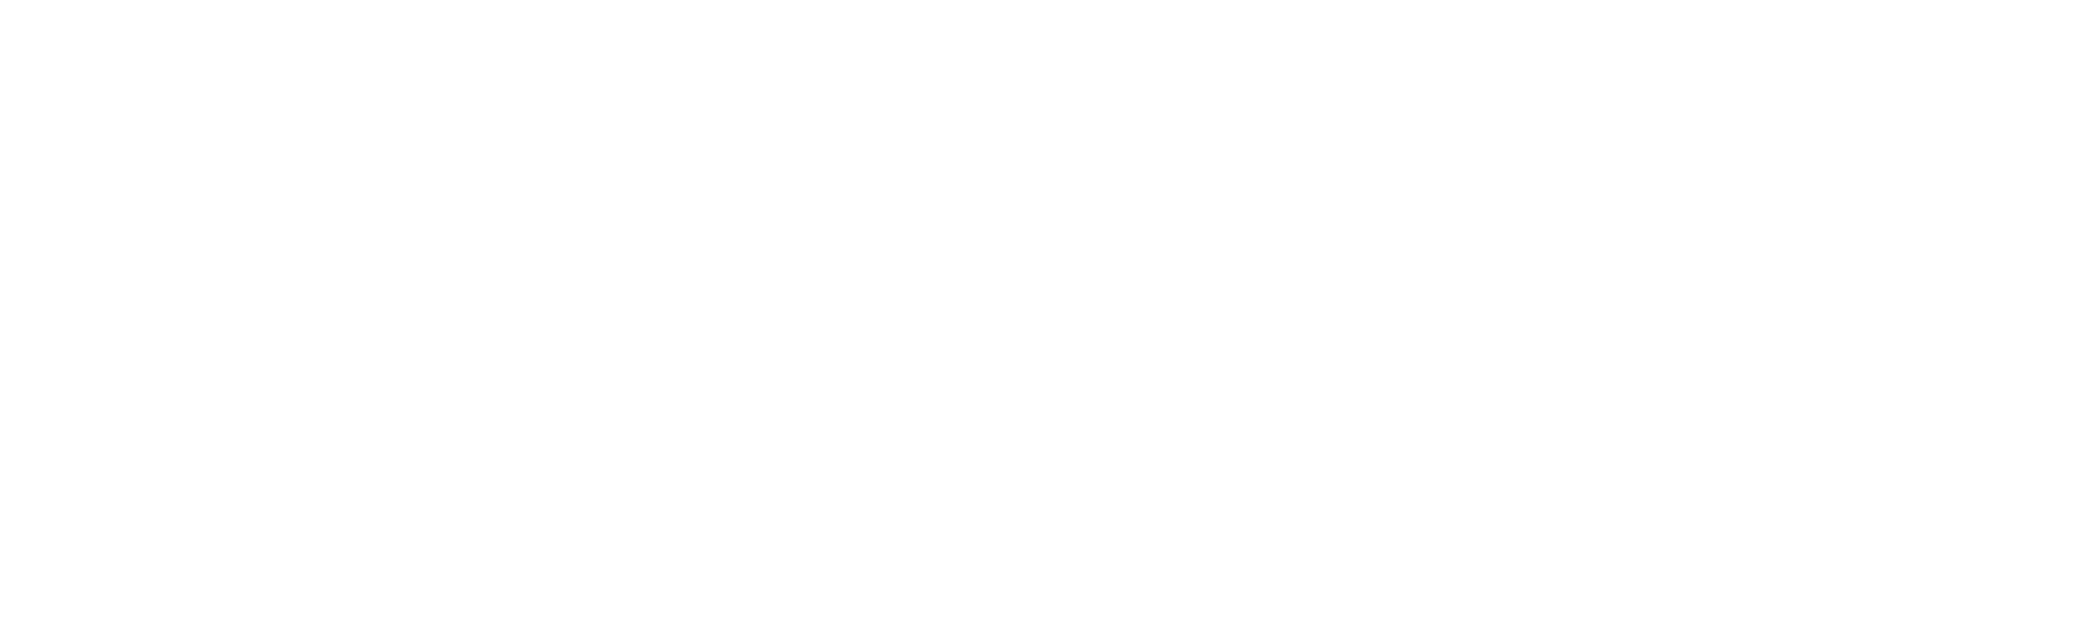 mission-chs-logo_wht-01.png